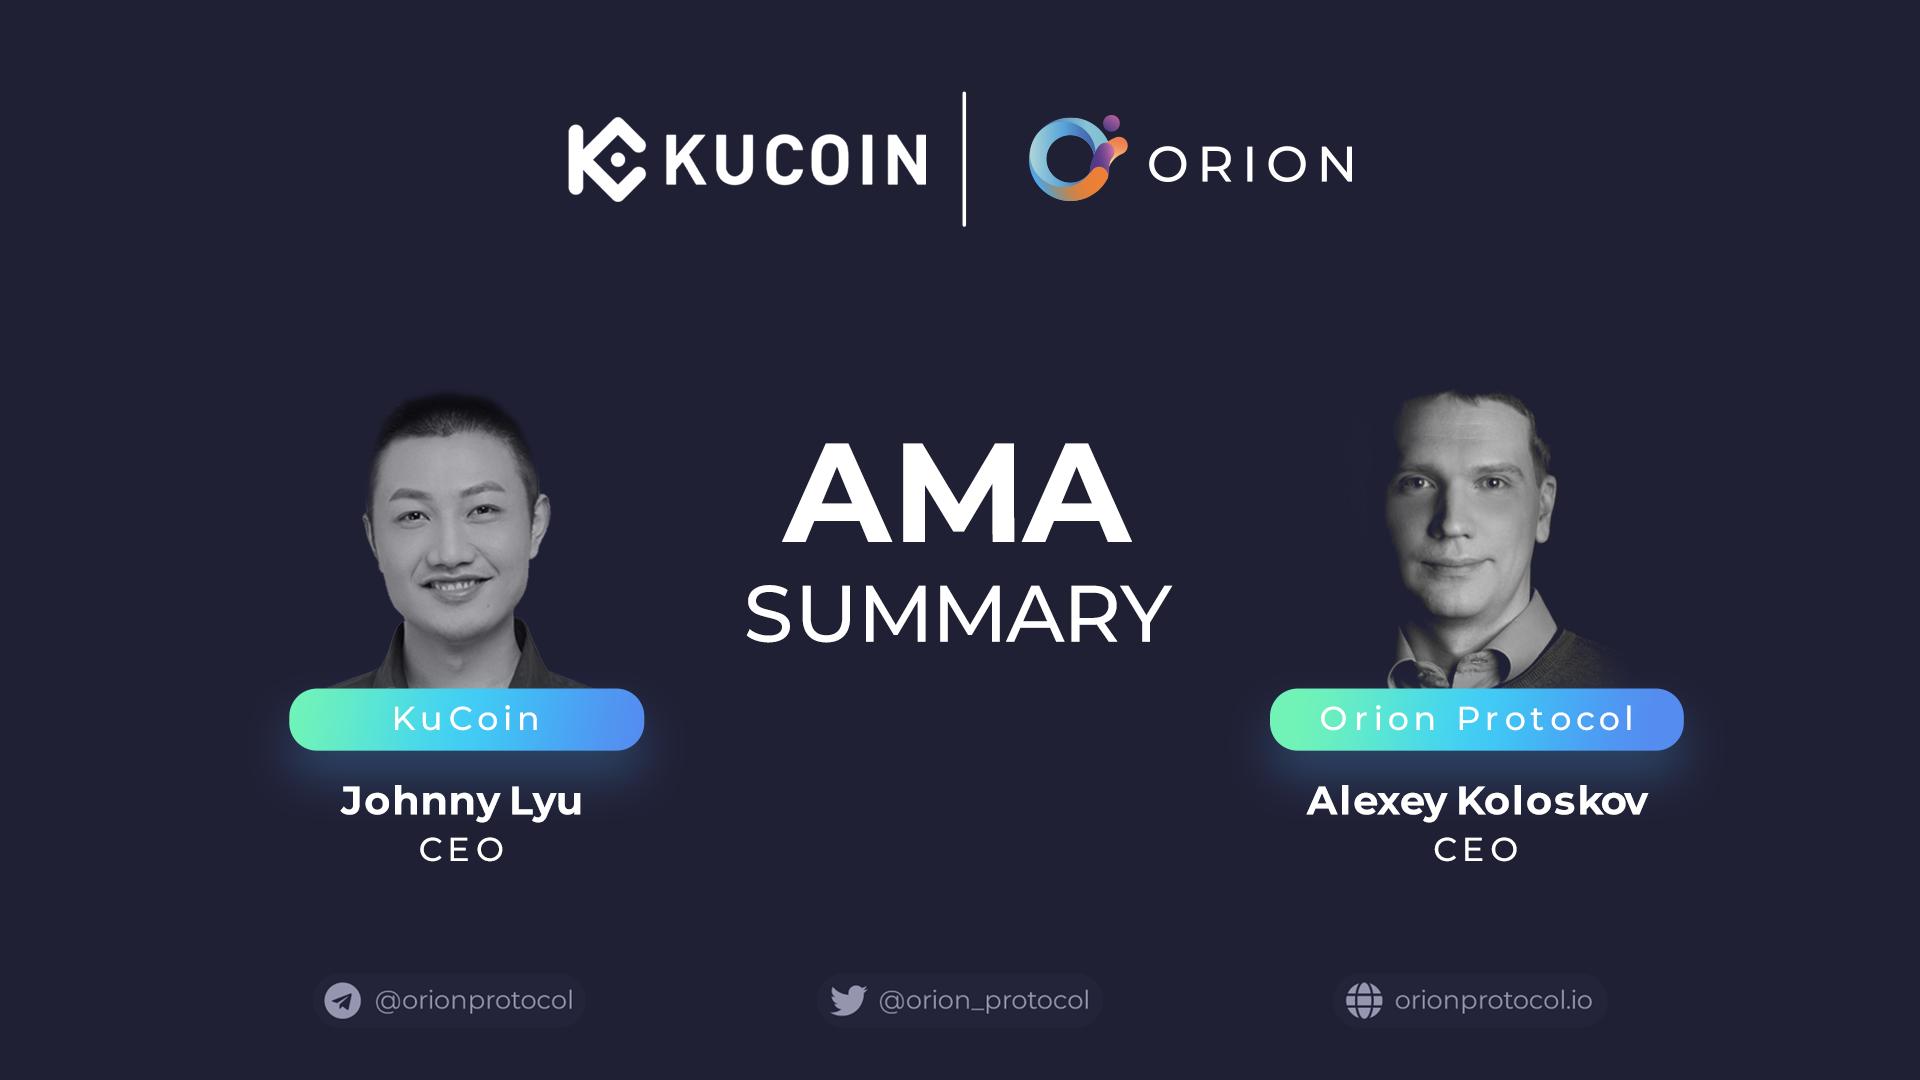 KuCoin + Orion Protocol: AMA